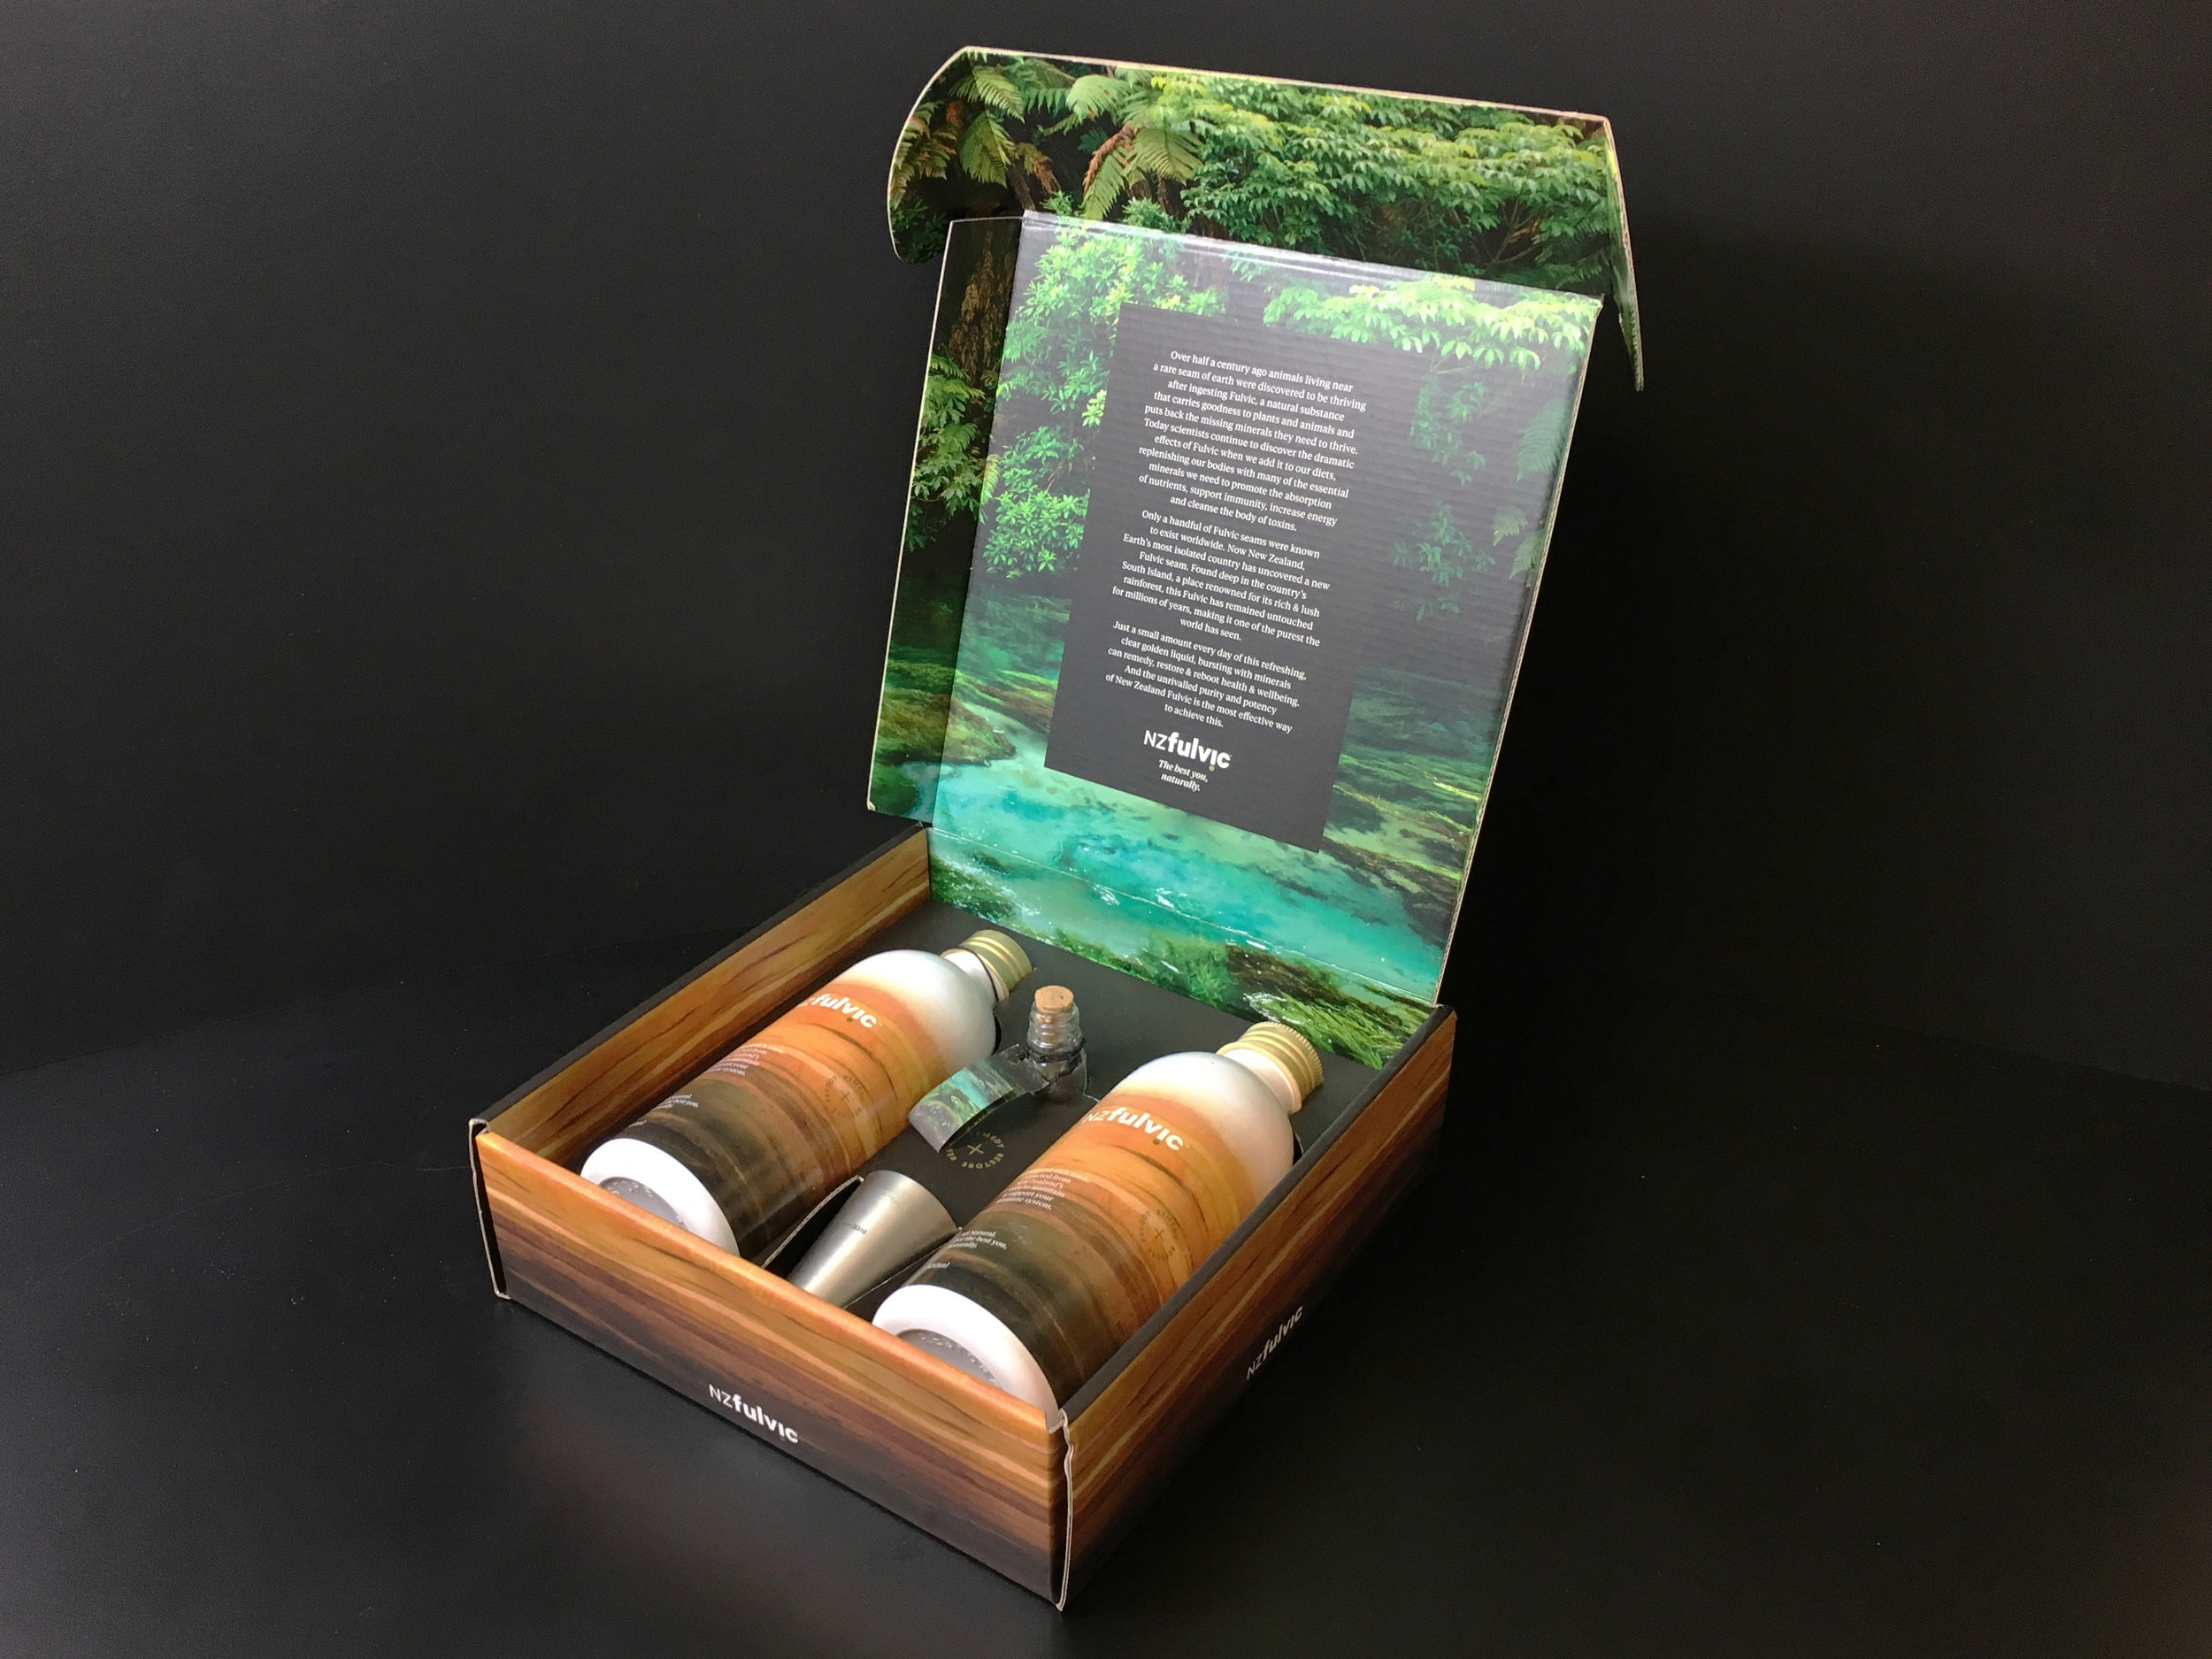 PromoMerch_Trade-Presenter-box-NZFulVic_LR.jpg